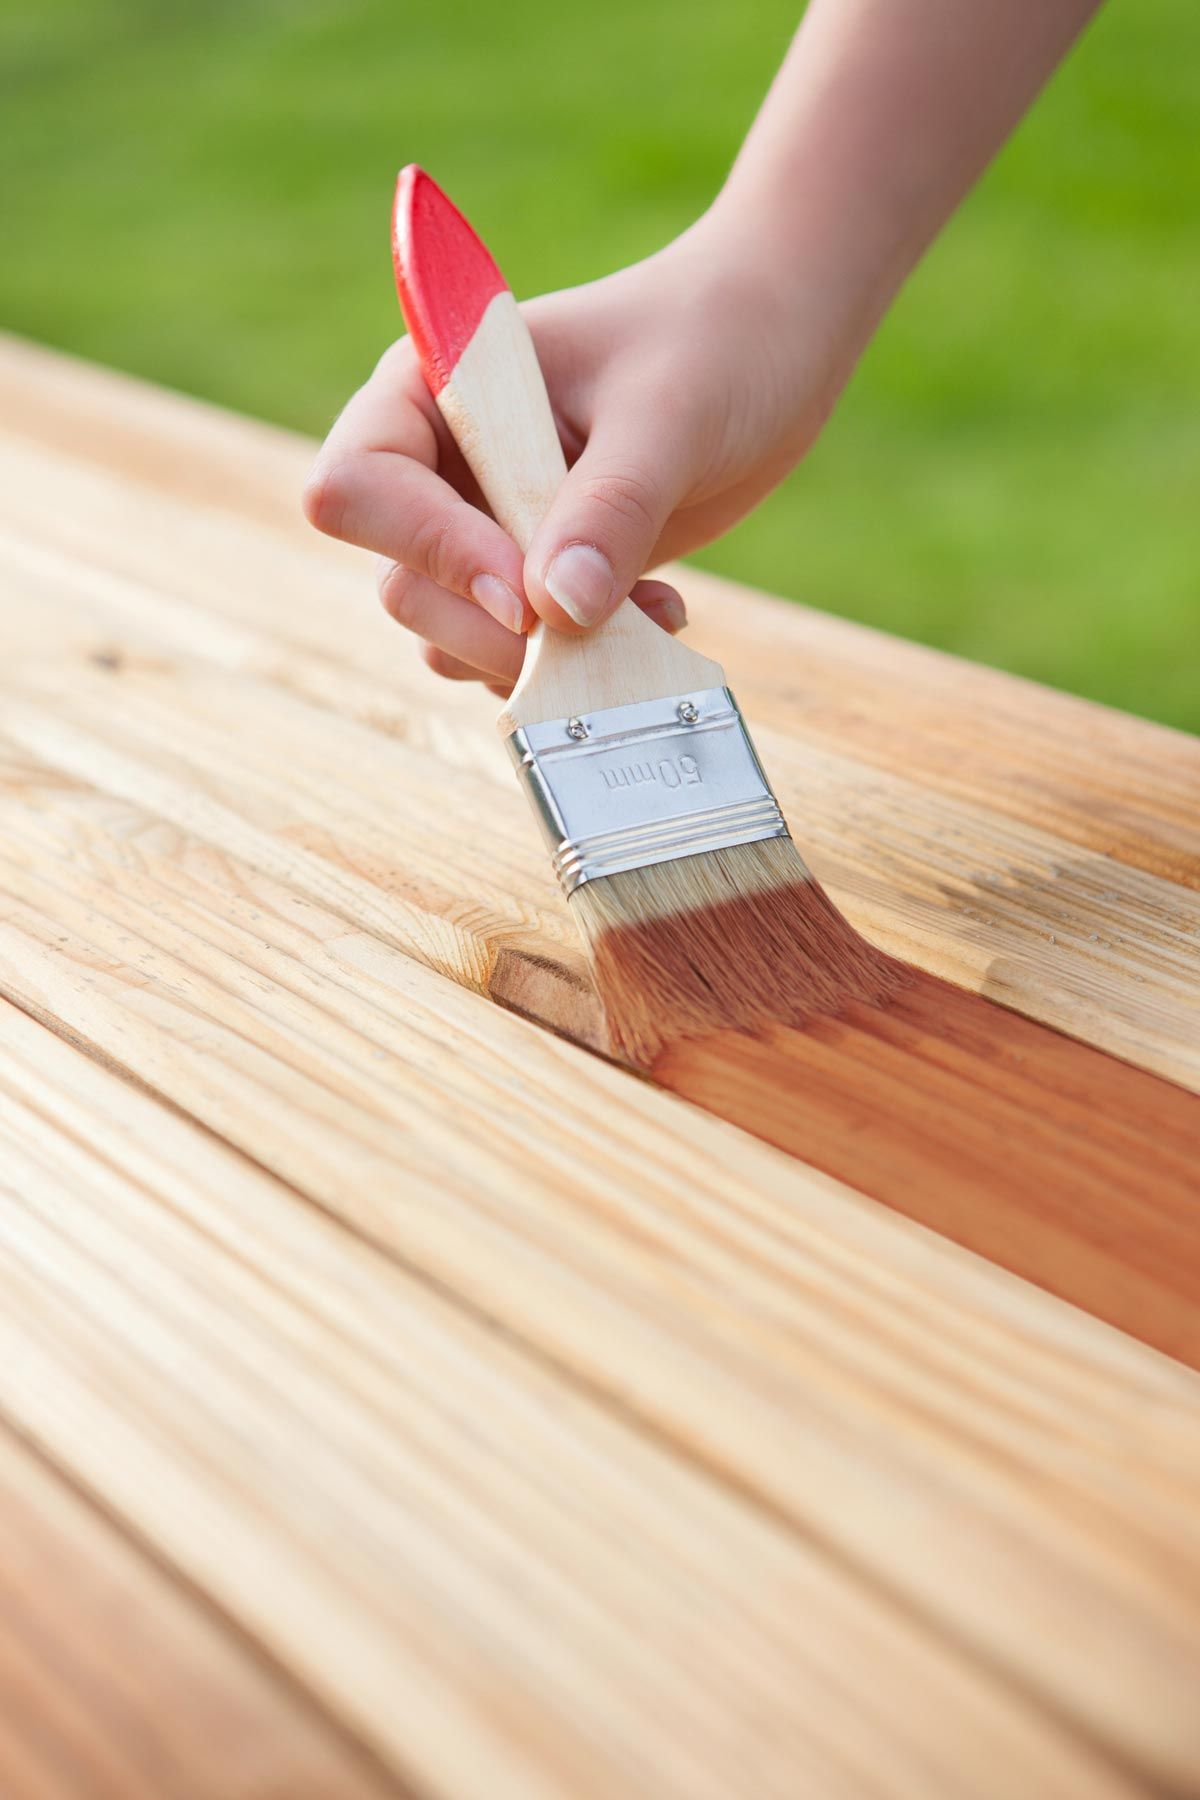 C mo barnizar la madera hogarmania - Como barnizar madera ...